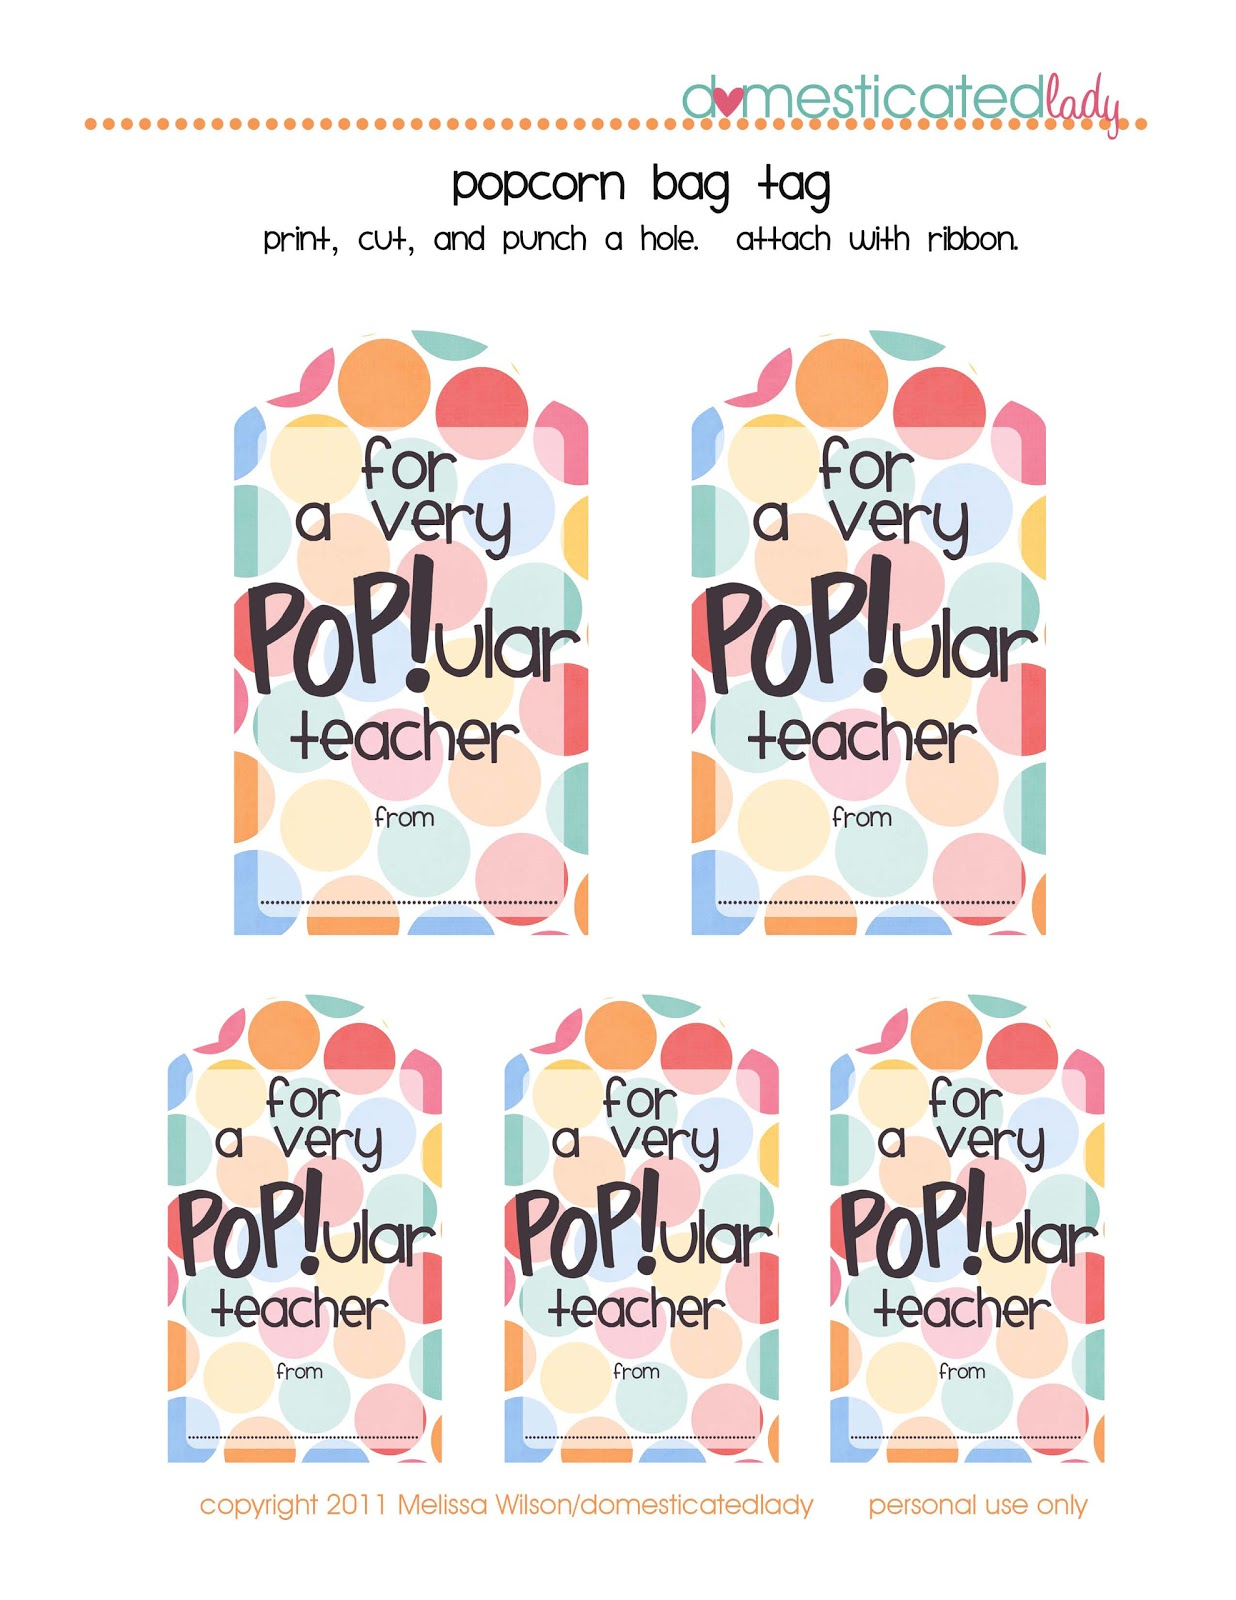 picture regarding Popcorn Teacher Appreciation Printable titled CocktailMom: Outstanding Trainer Appreciation Present